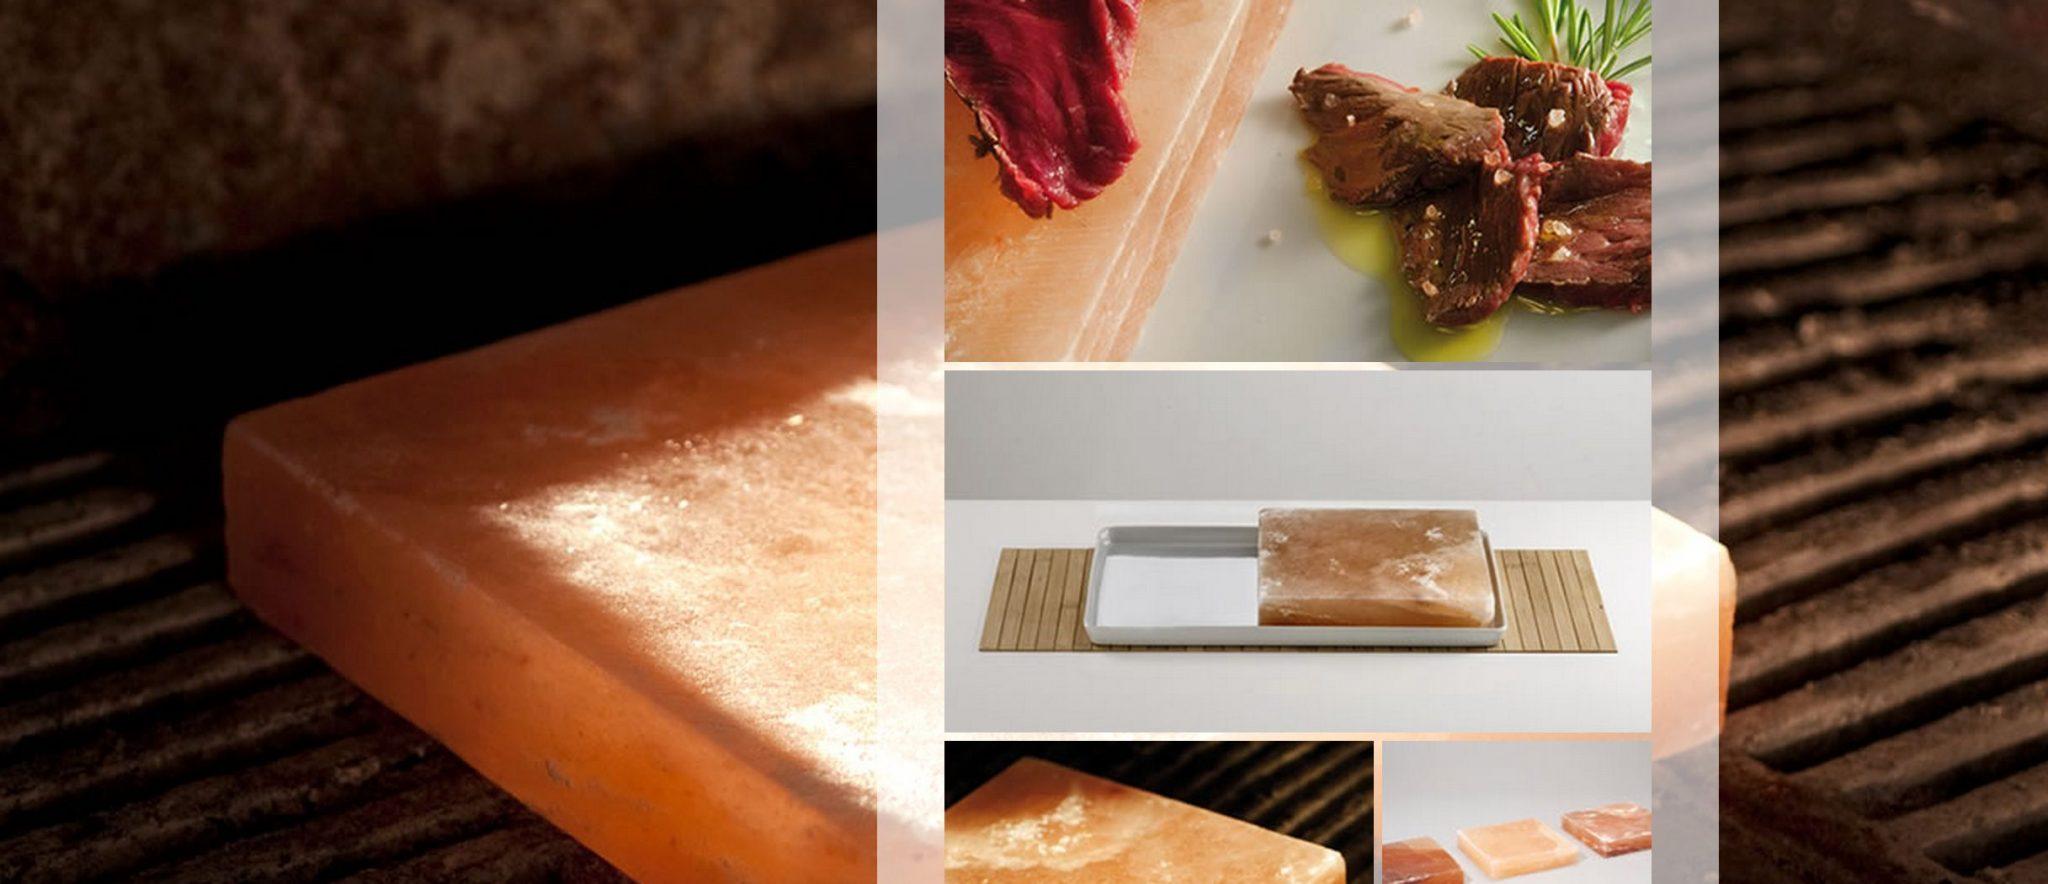 Modern kitchen cookware